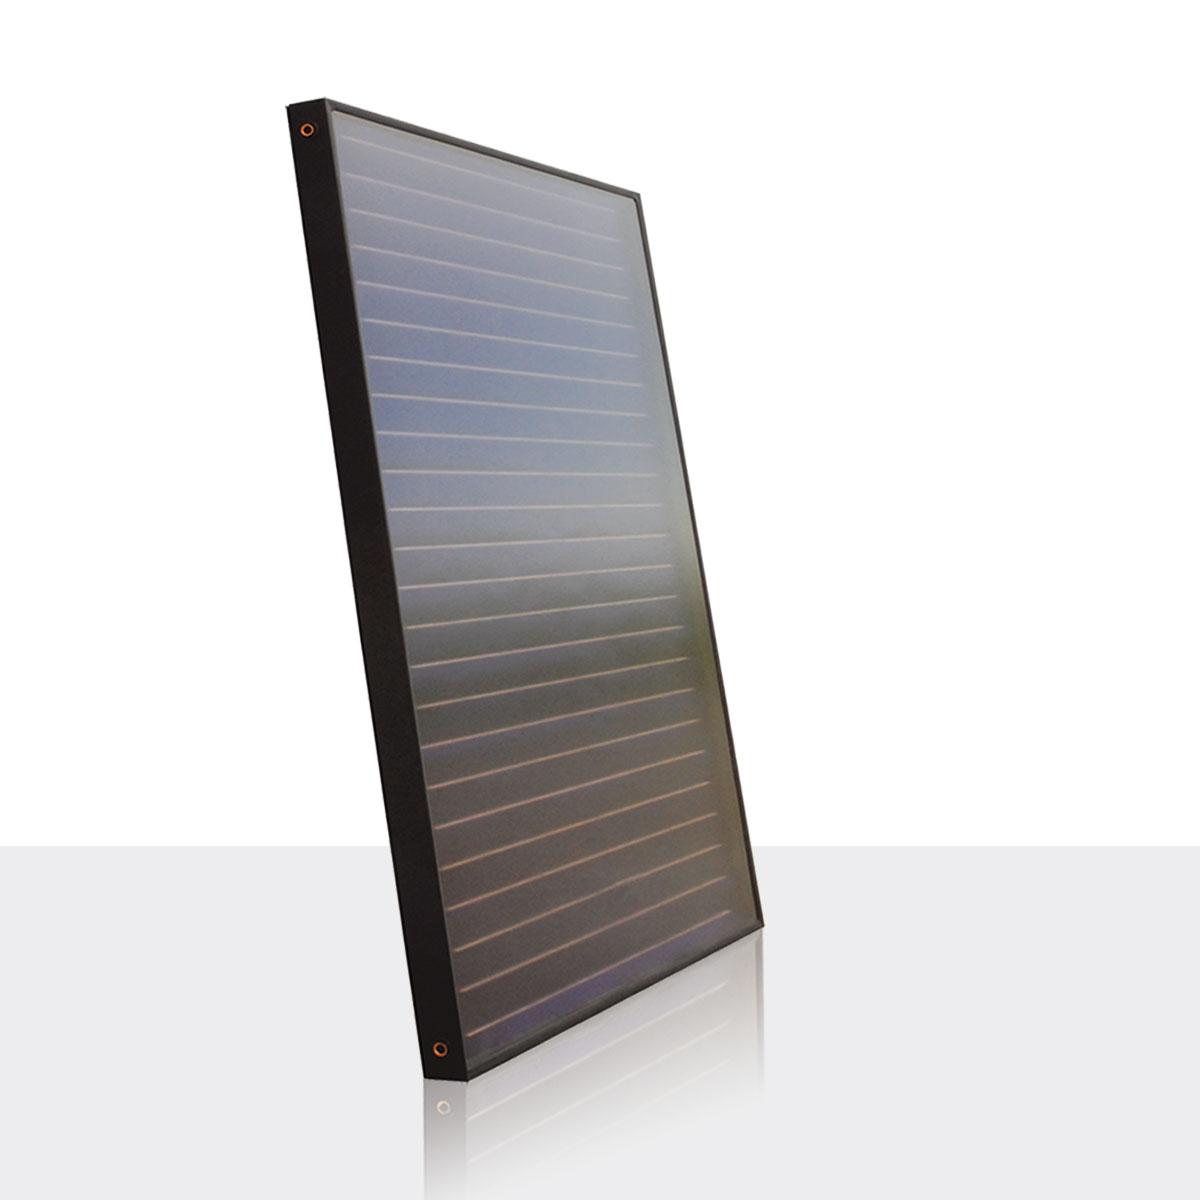 FLACHKOLLEKTOR SOLARKOLLEKTOR SOLARANLAGE SOLAR WARMWASSER FLACHKOLLEKTOREN